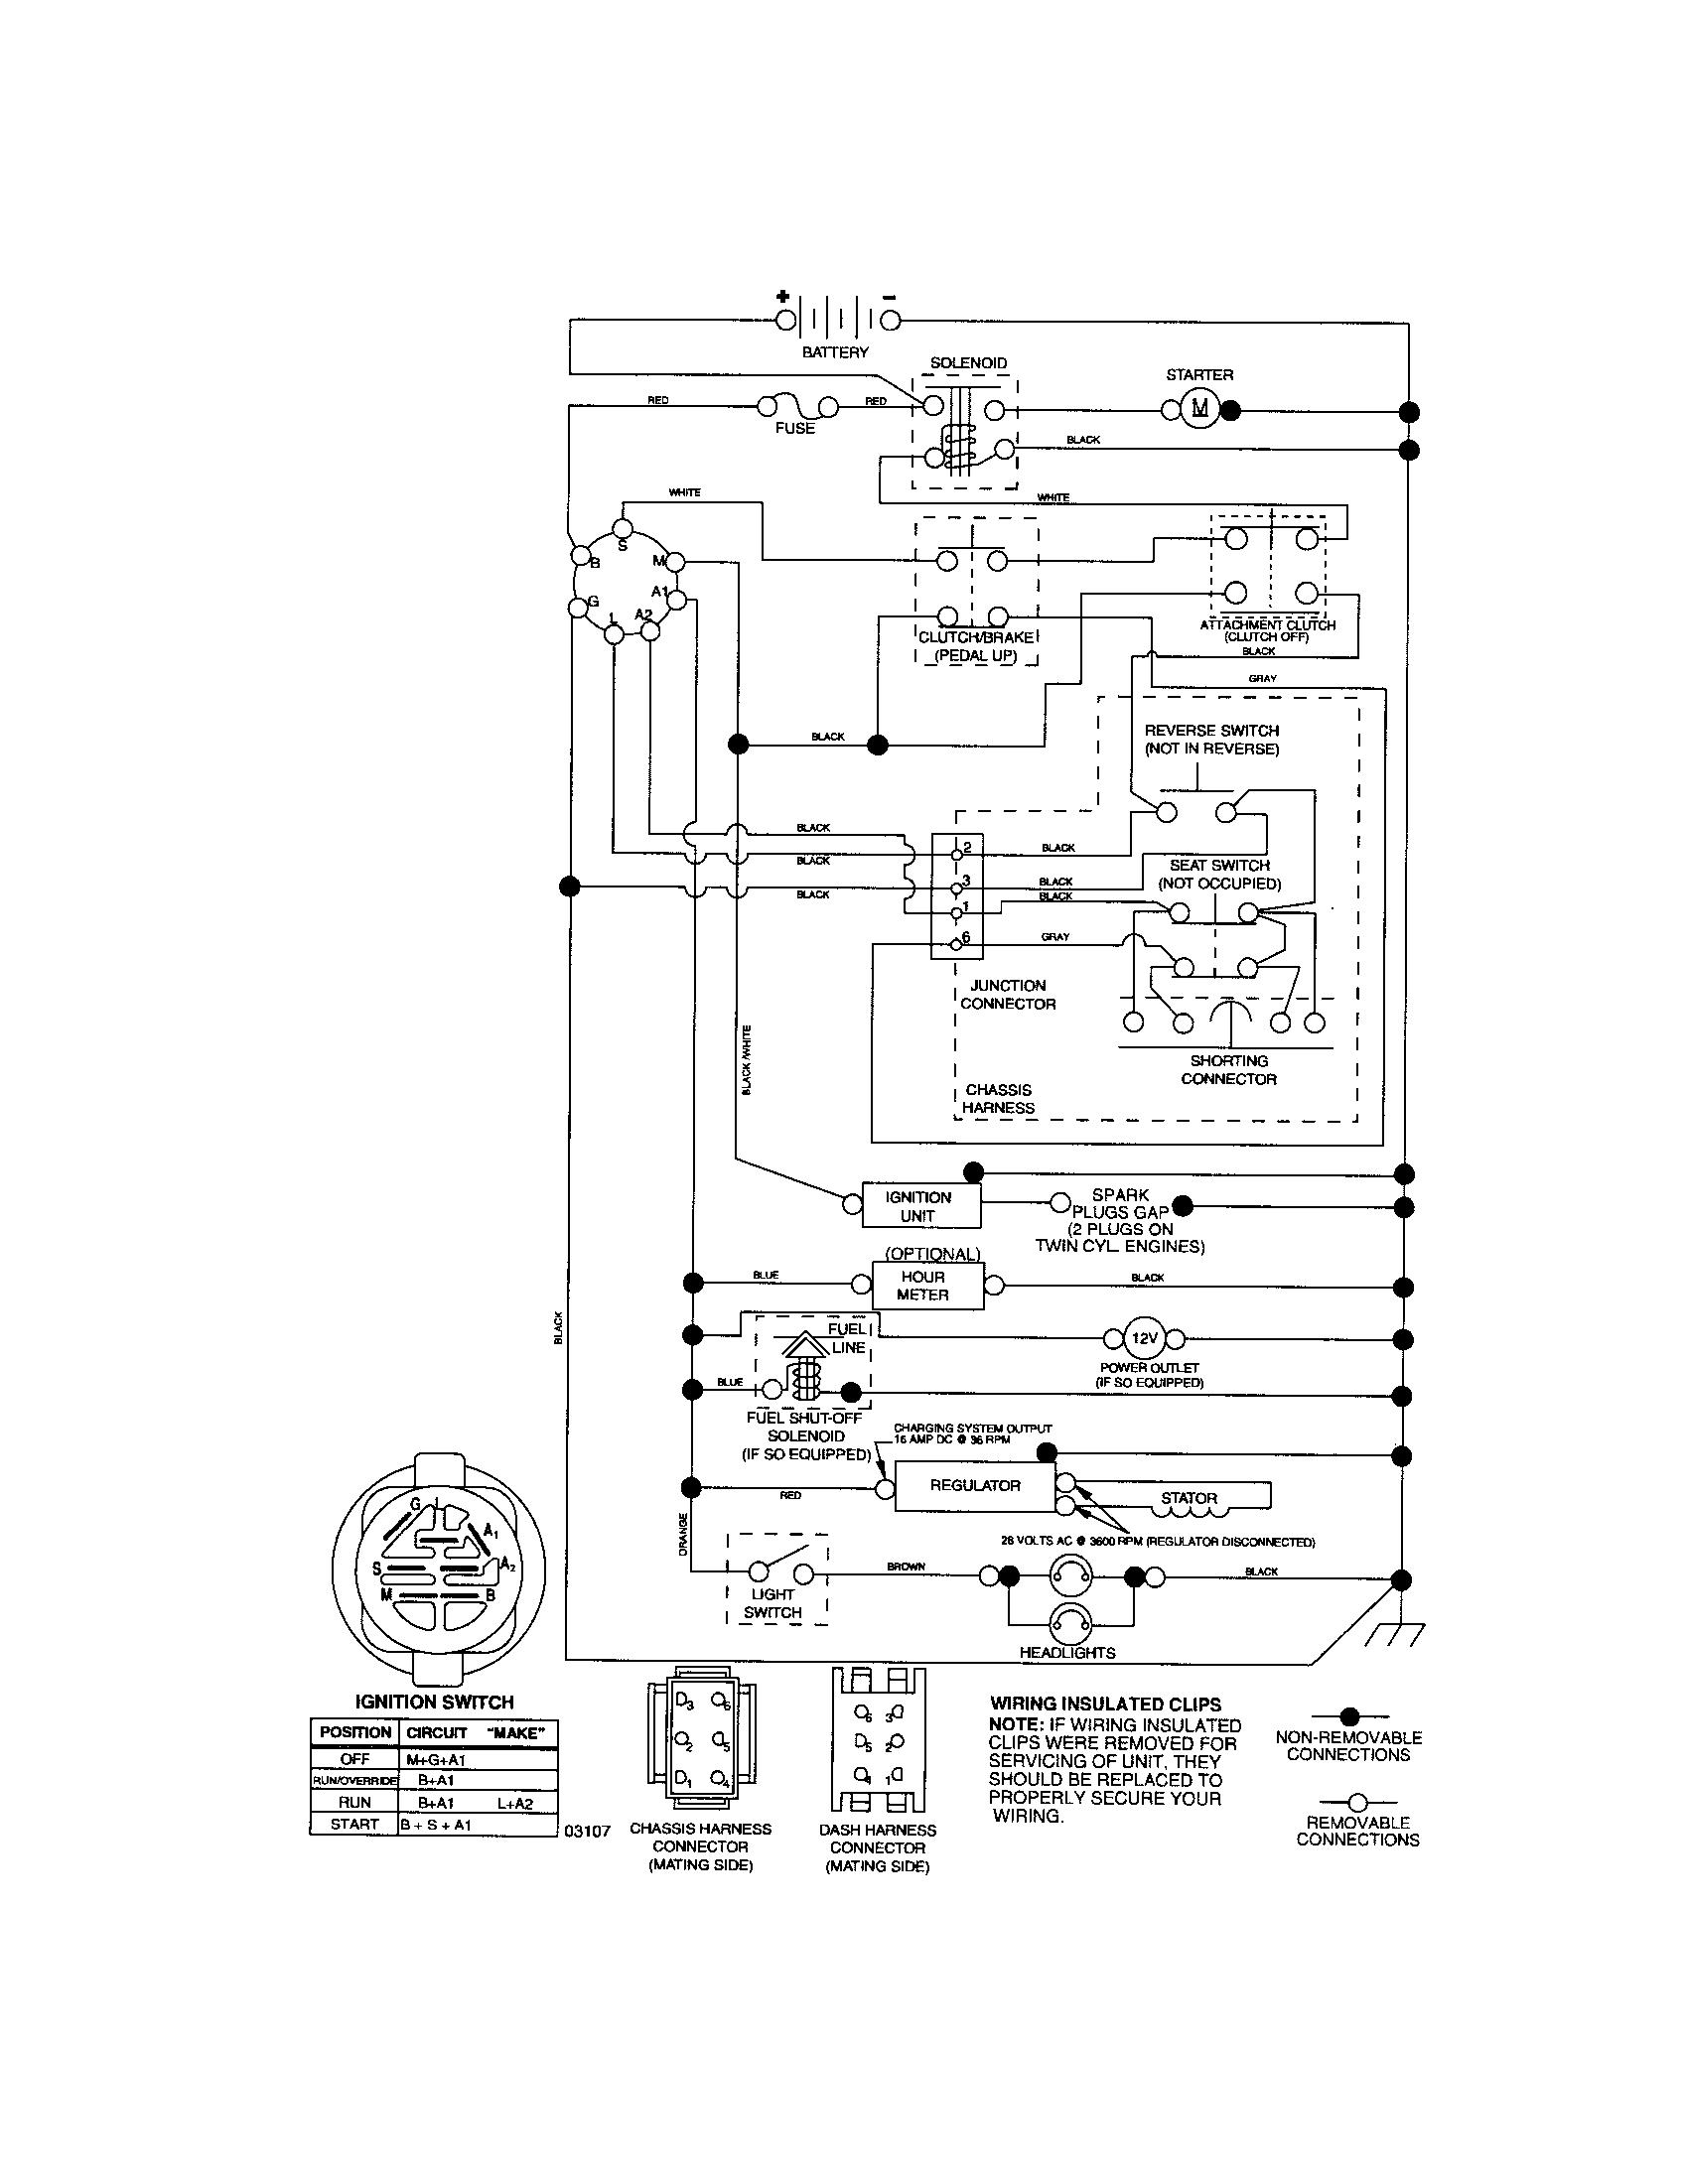 Wiring Diagram For Craftsman Riding Lawn Mower